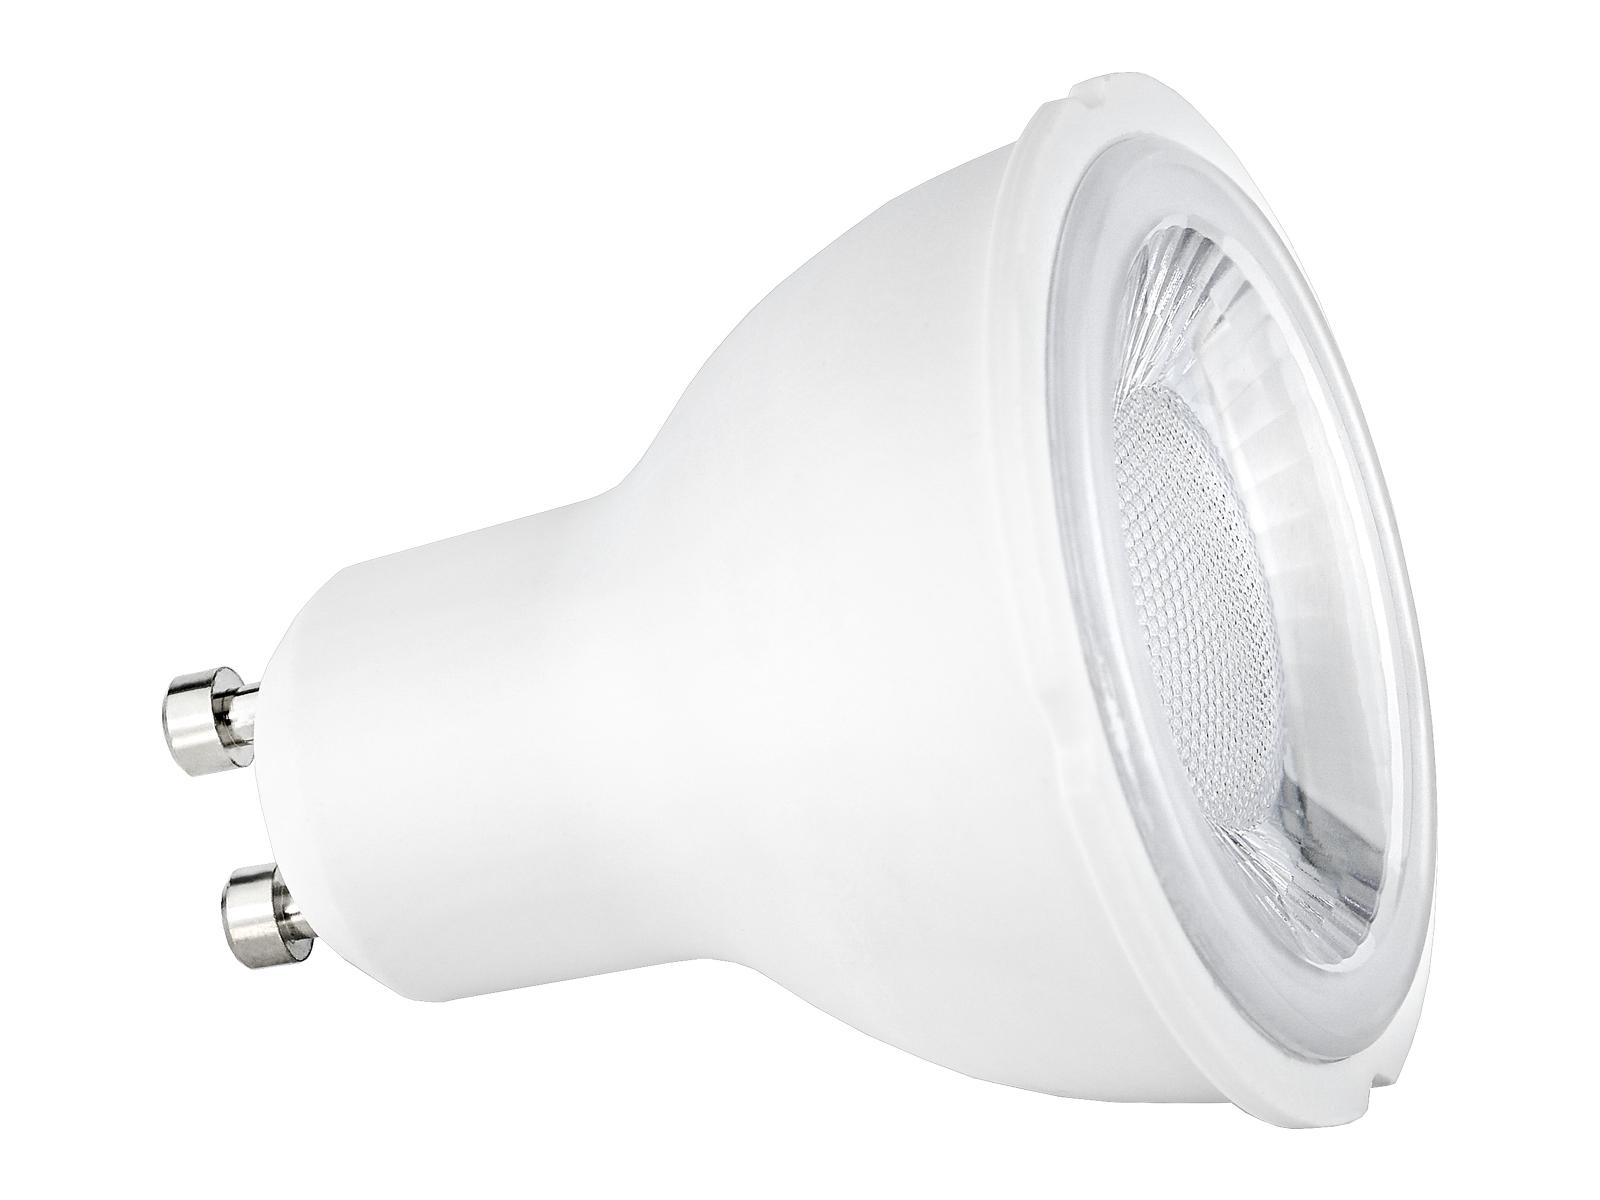 Gu10 led lampen kaufen bei led lichtraum led leuchtmittel ssc luxon 35w smd 280 lm 230v gu10 parisarafo Choice Image